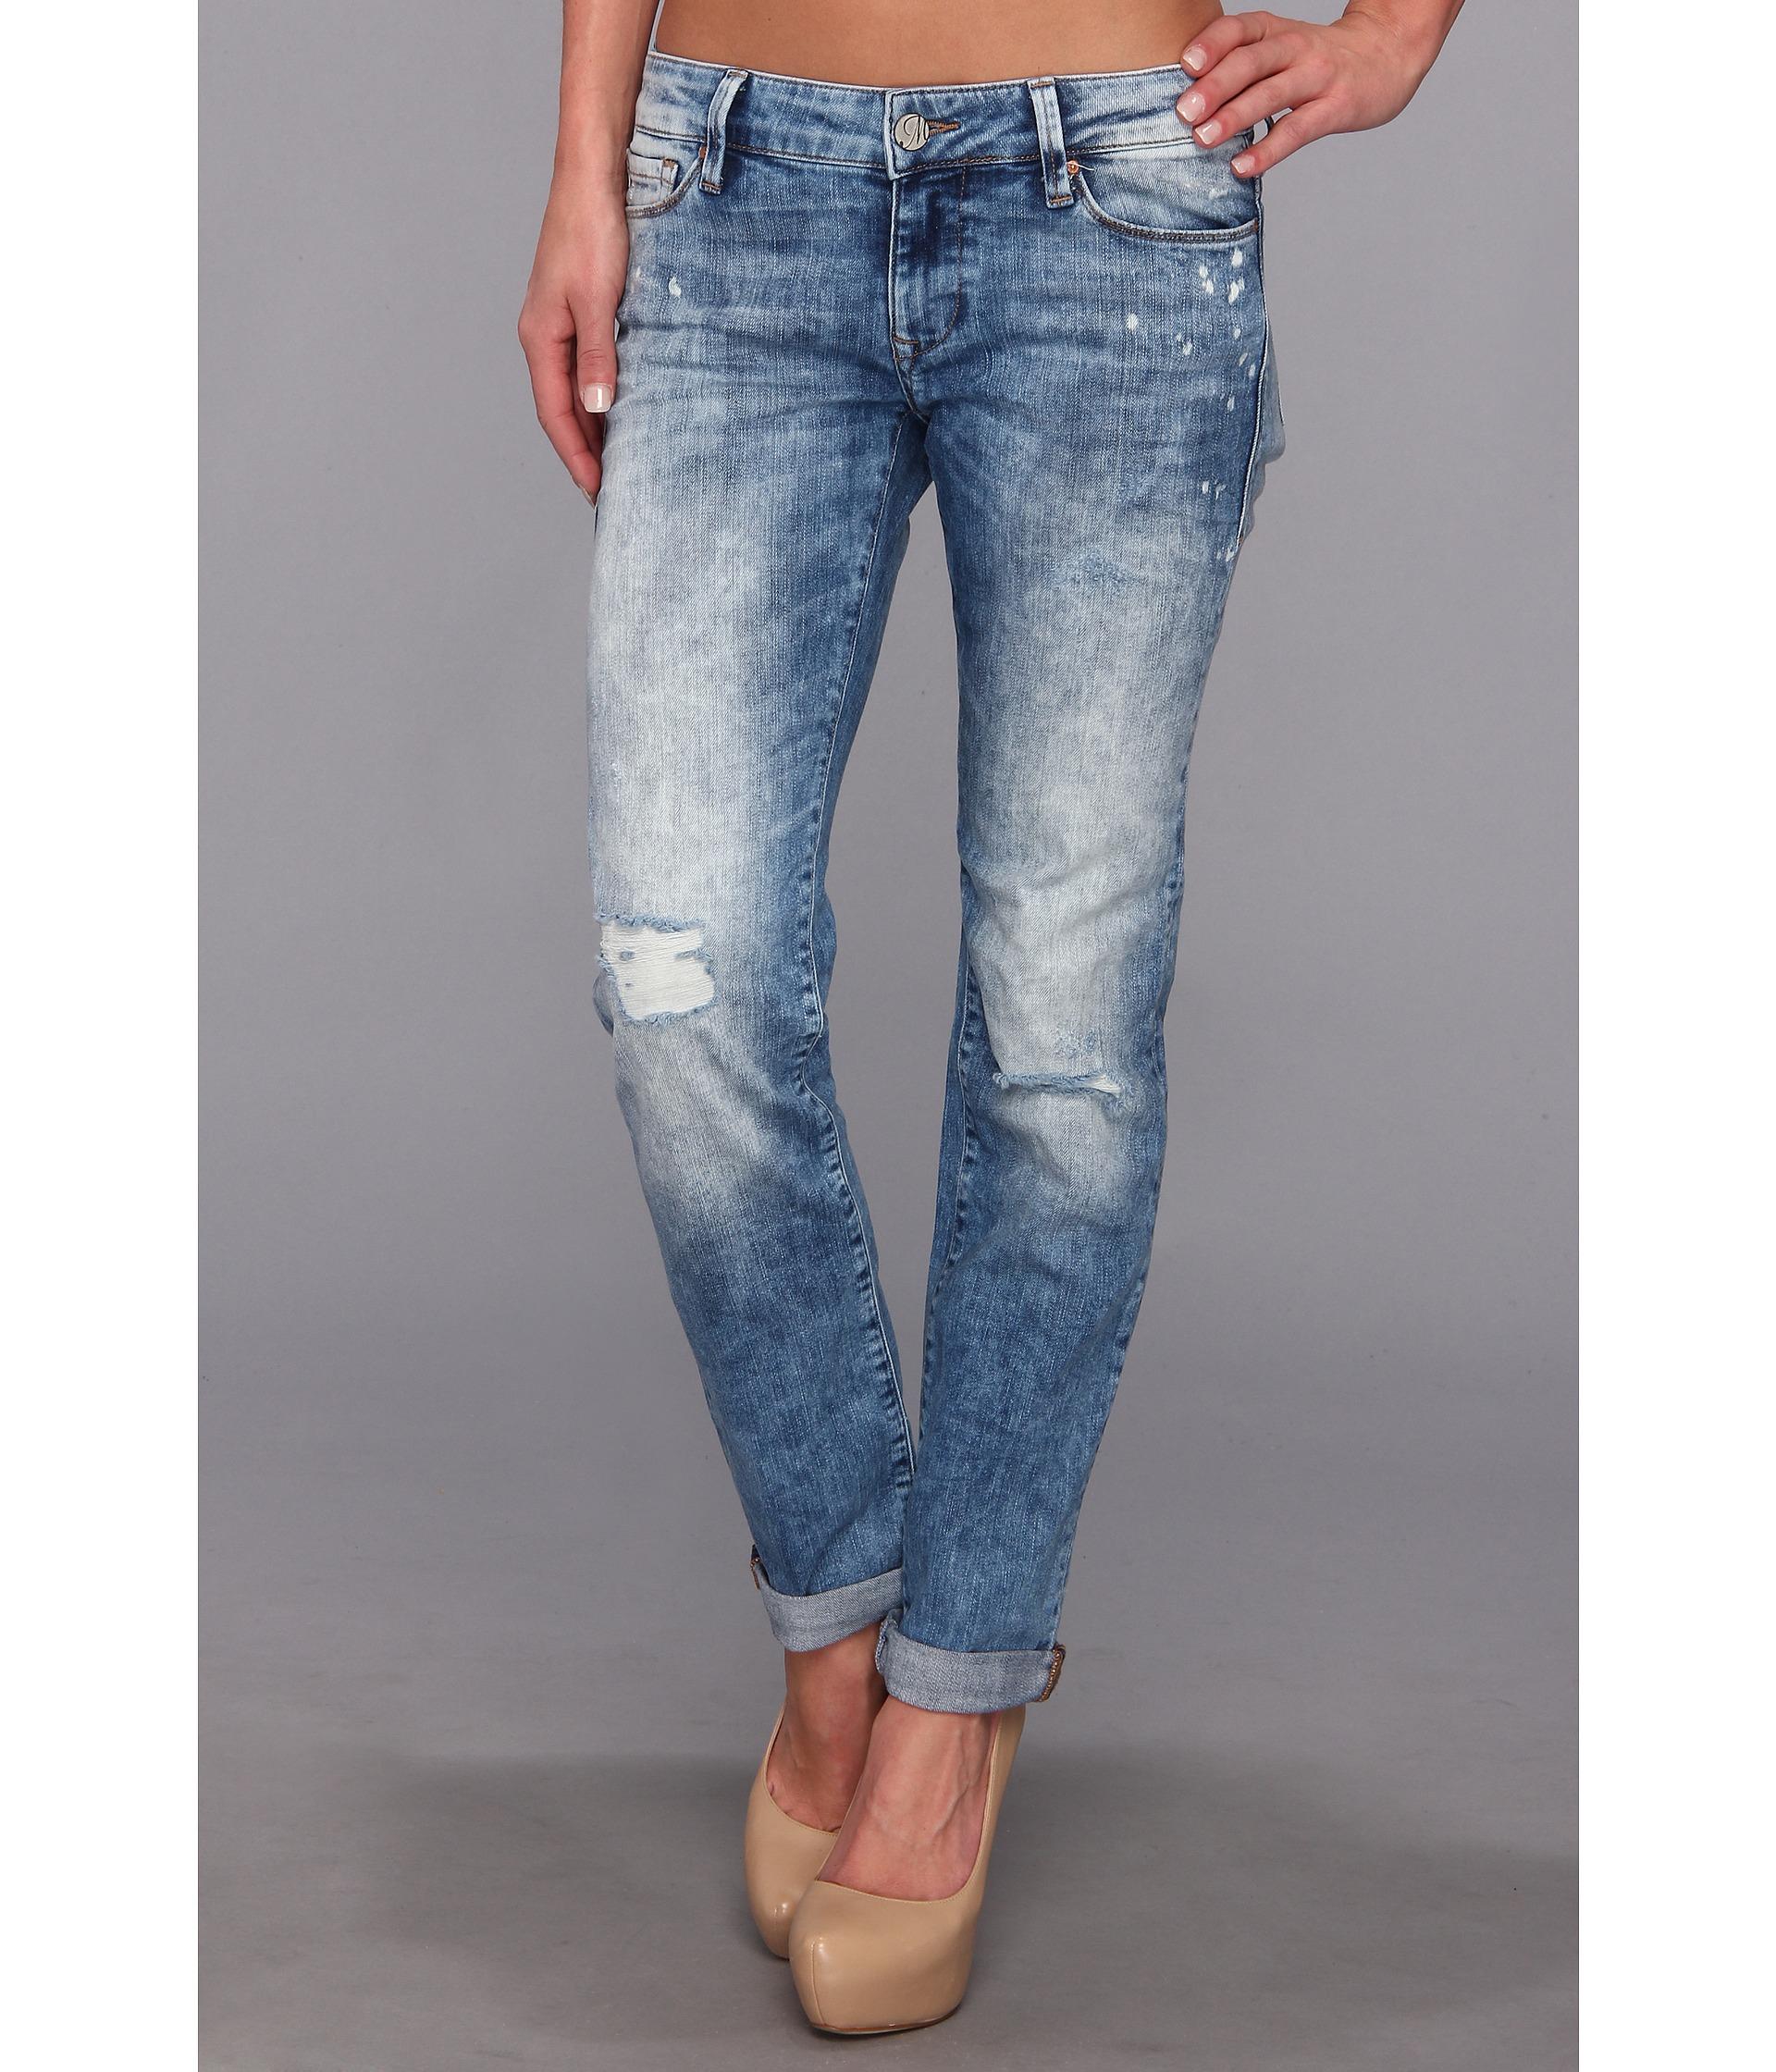 ba9926db75 Lyst - Mavi Jeans Emma Slim Boyfriend in Painted Artist Vintage in Blue